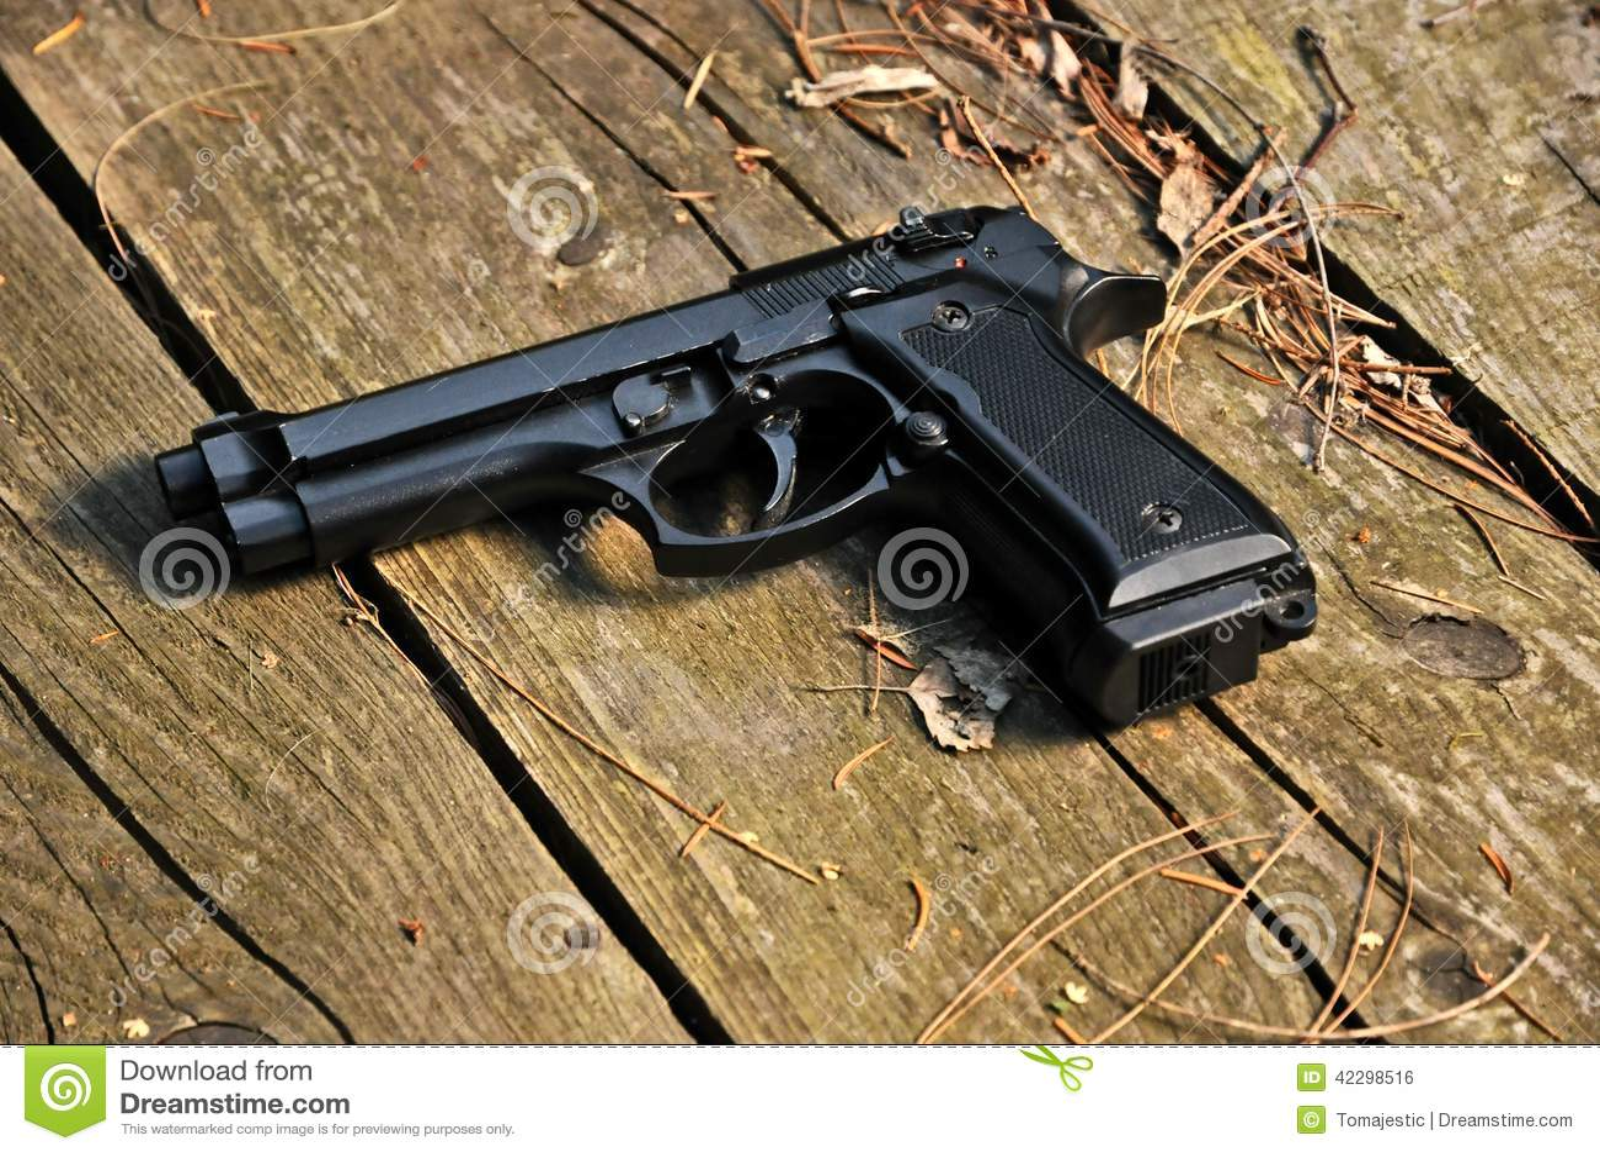 Black Gun Mm Wooden Floor moreover Tilt Tray in addition Es Distress in addition Porcmarks Lg in addition Fdenca. on semi clipart